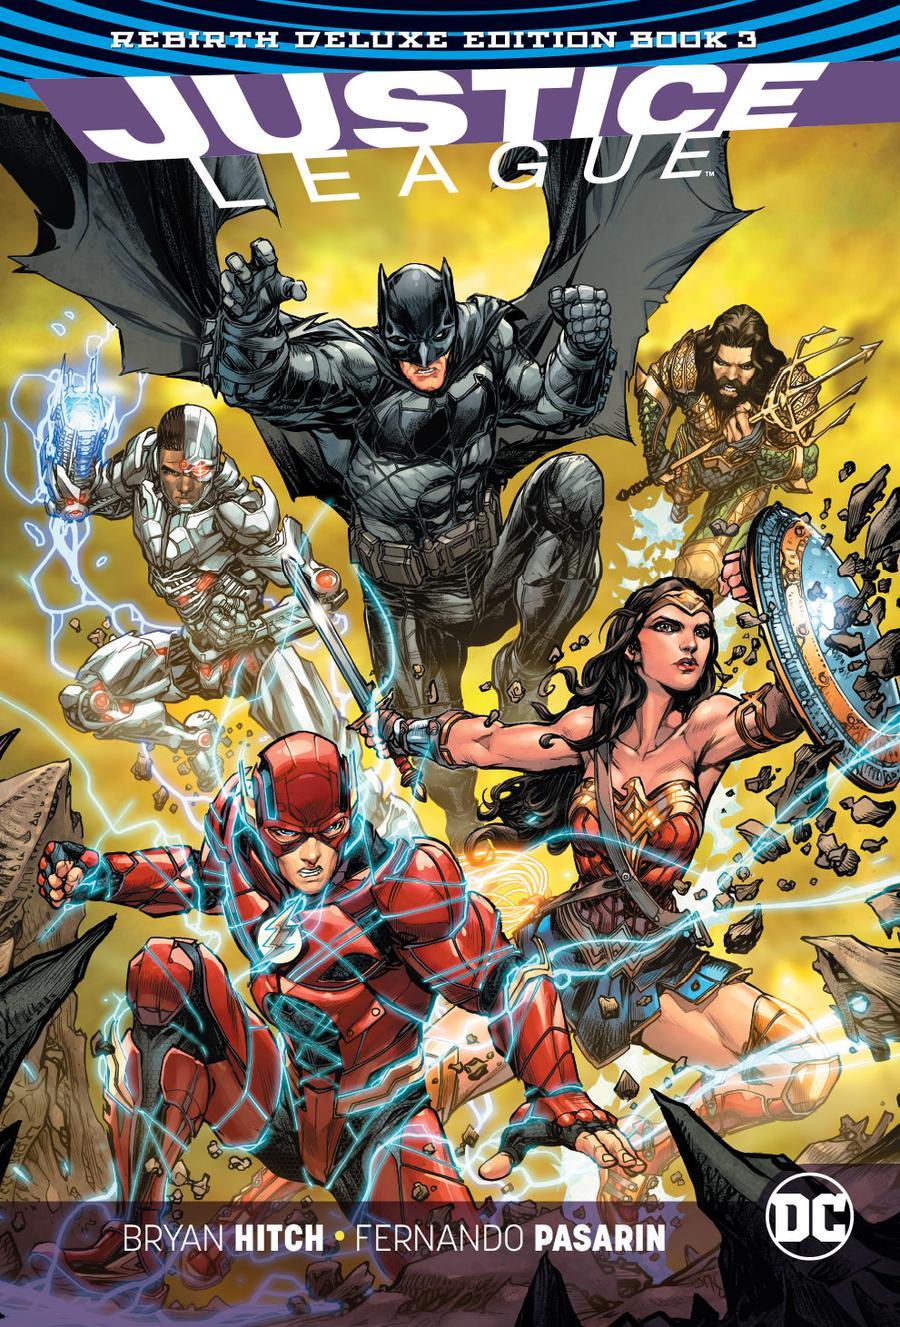 Justice League Rebirth Deluxe Edition Book 3 HC